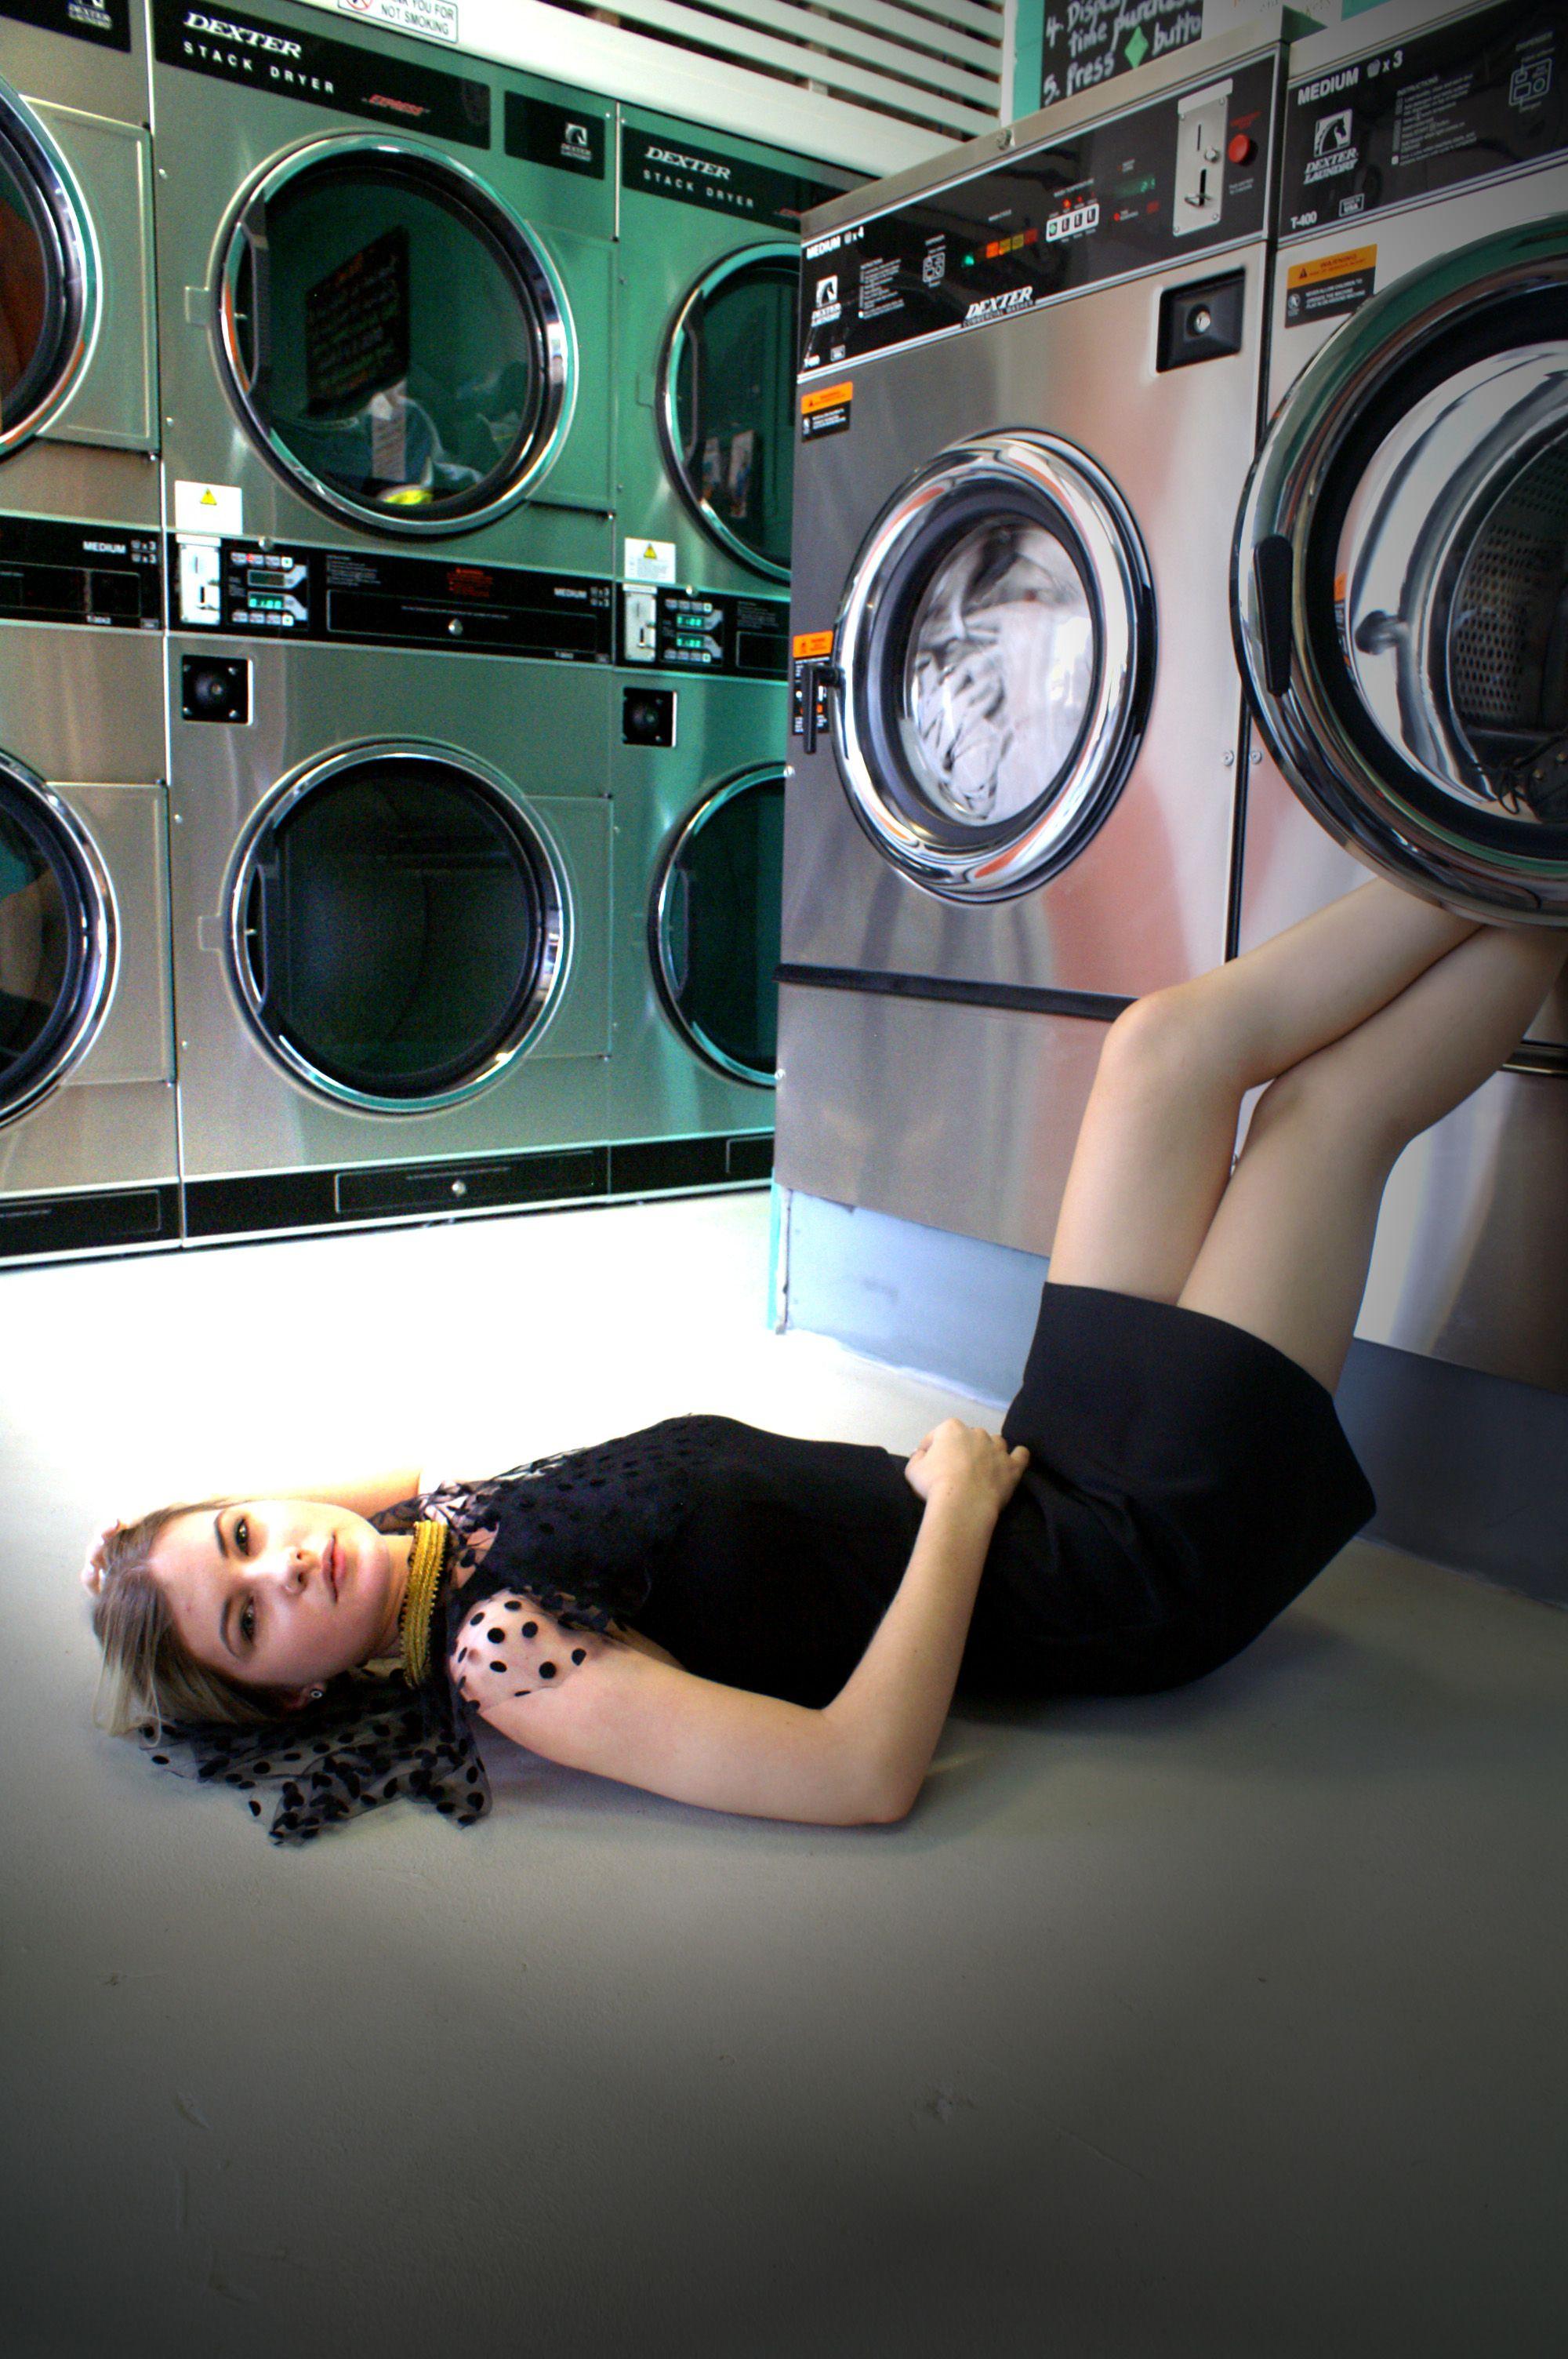 Black Dress Photo Shoot At The Laundromat Kianadesigns Fashion